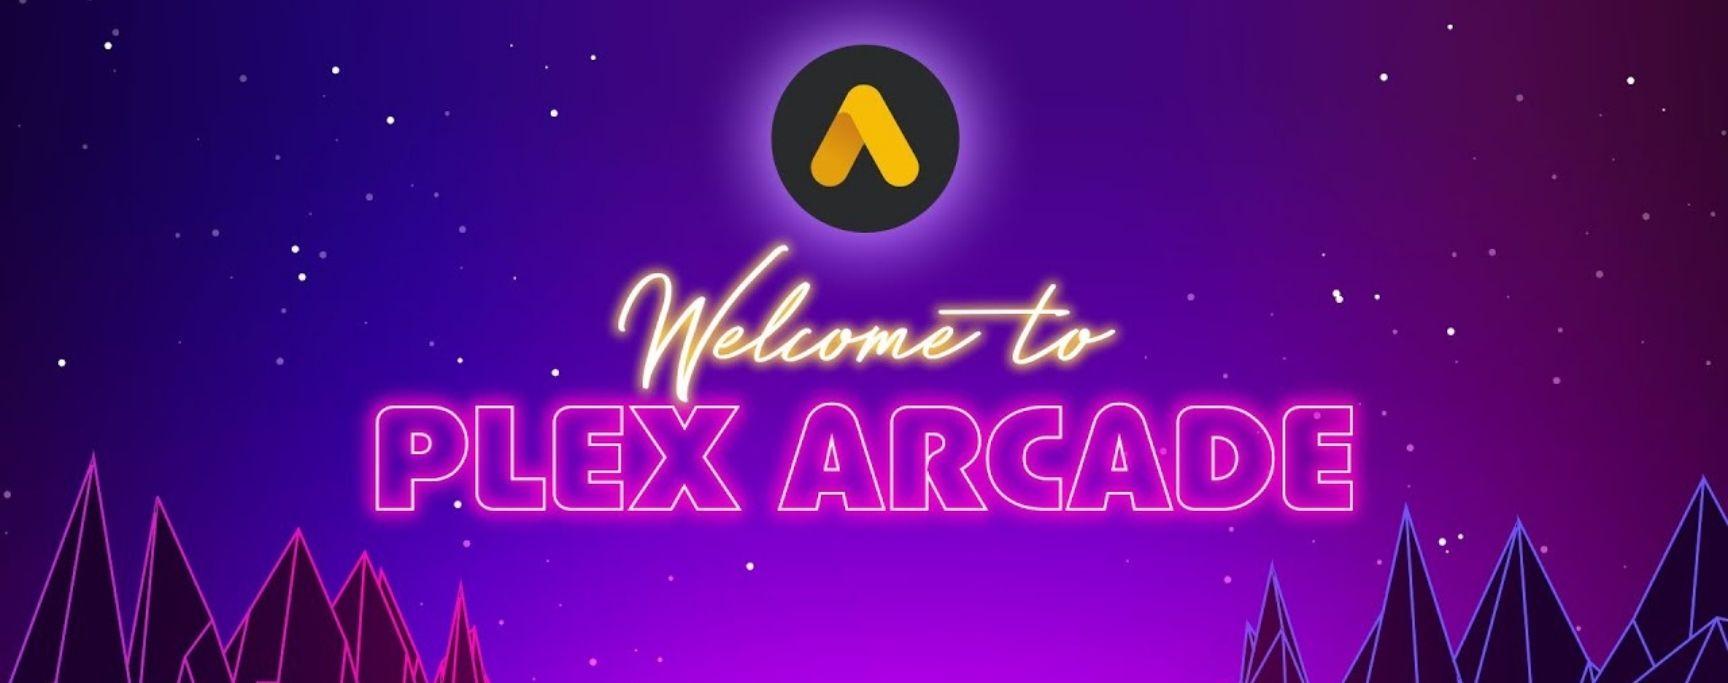 plex arcade